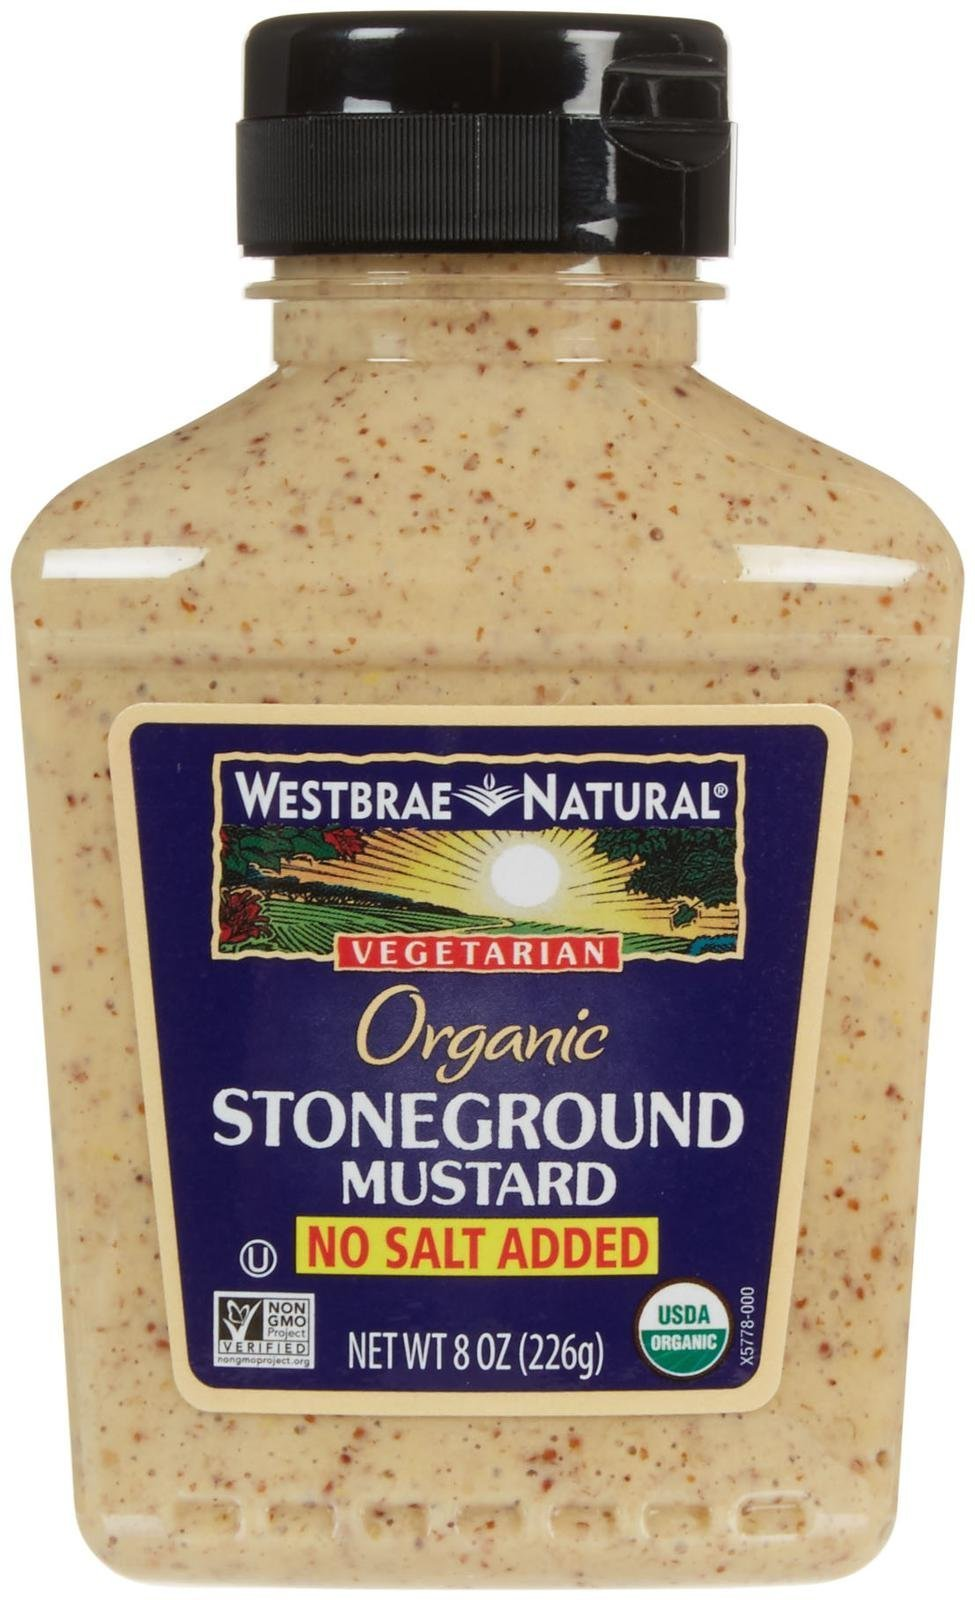 Westbrae Organic Stoneground Mustard No Salt Added, 8 Ounce